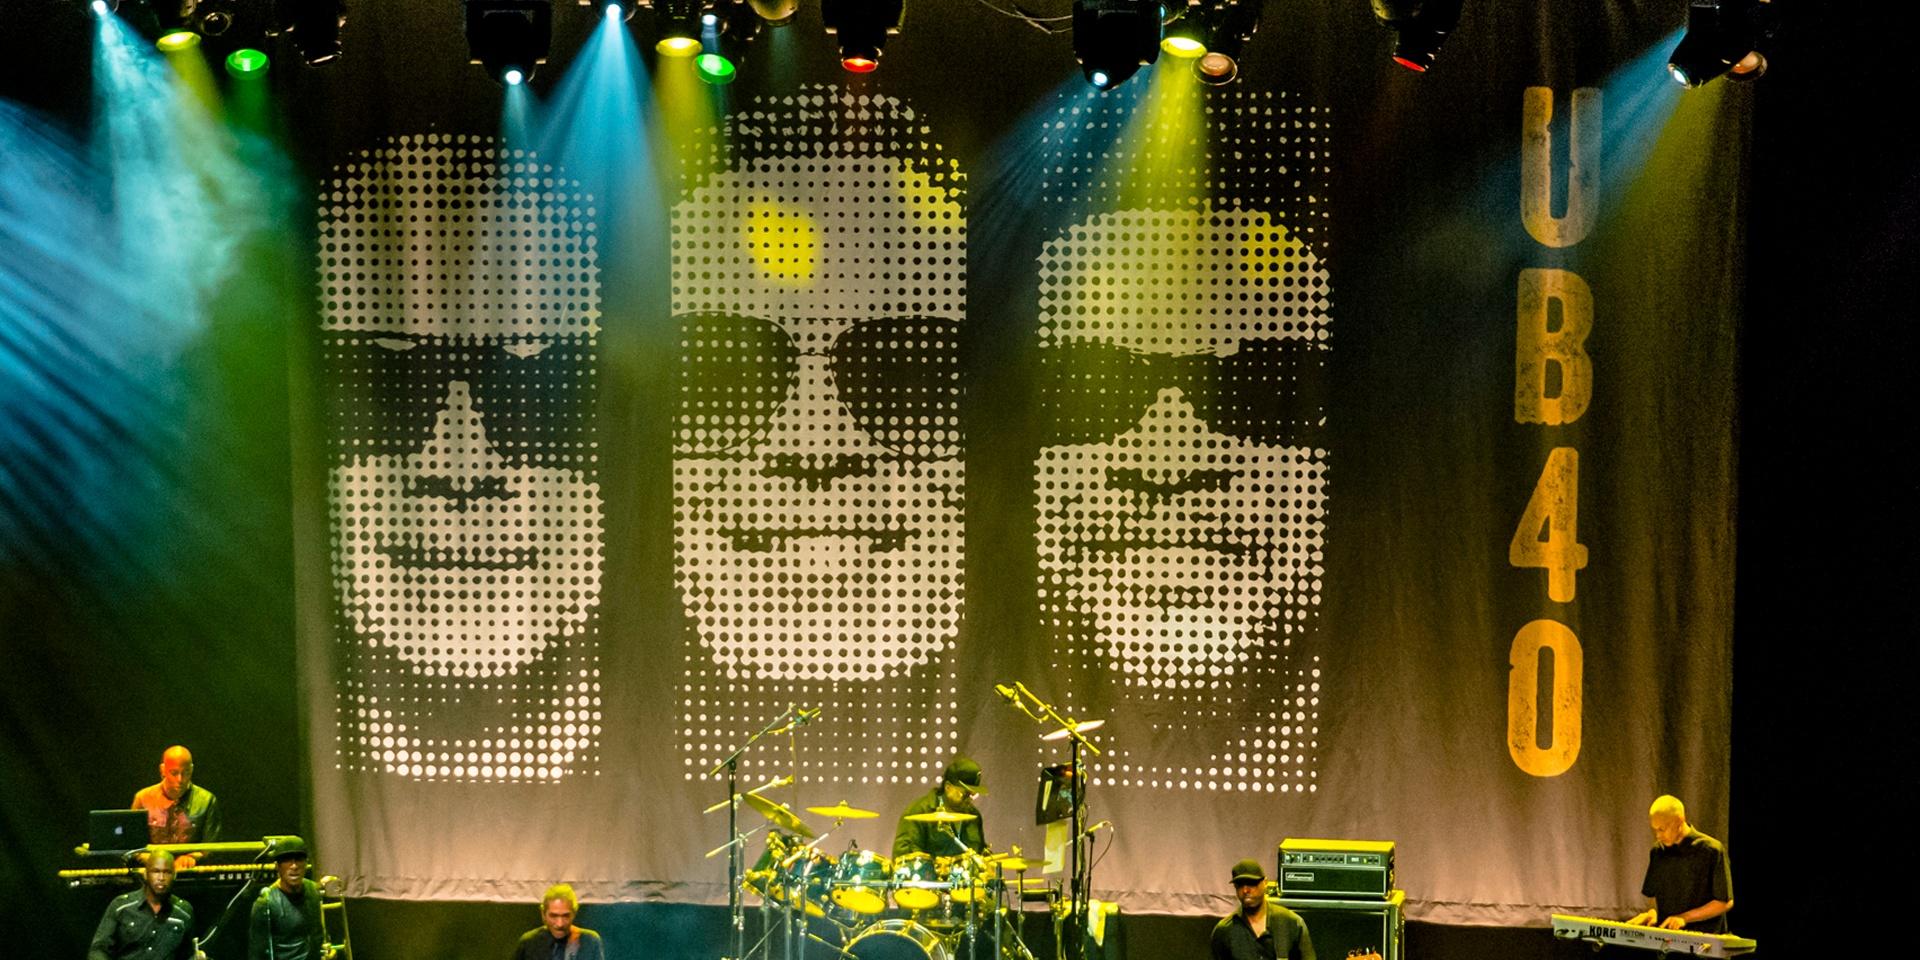 GIG REPORT: UB40 members continue feel-good reggae pop as We Are UB40